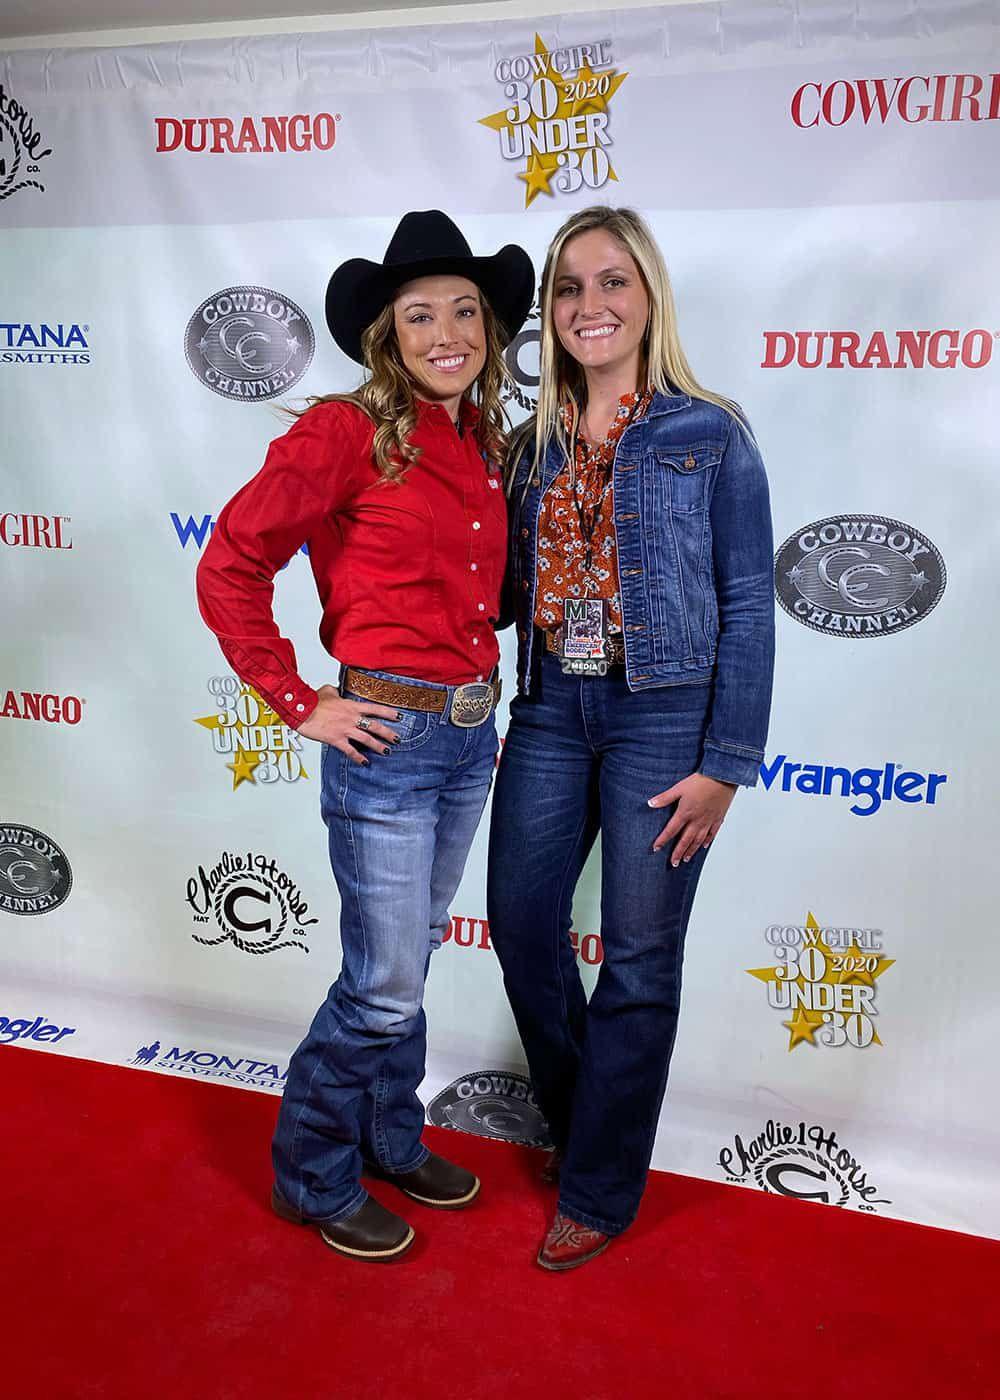 cowgirl 30 under 30 cowgirl magazine